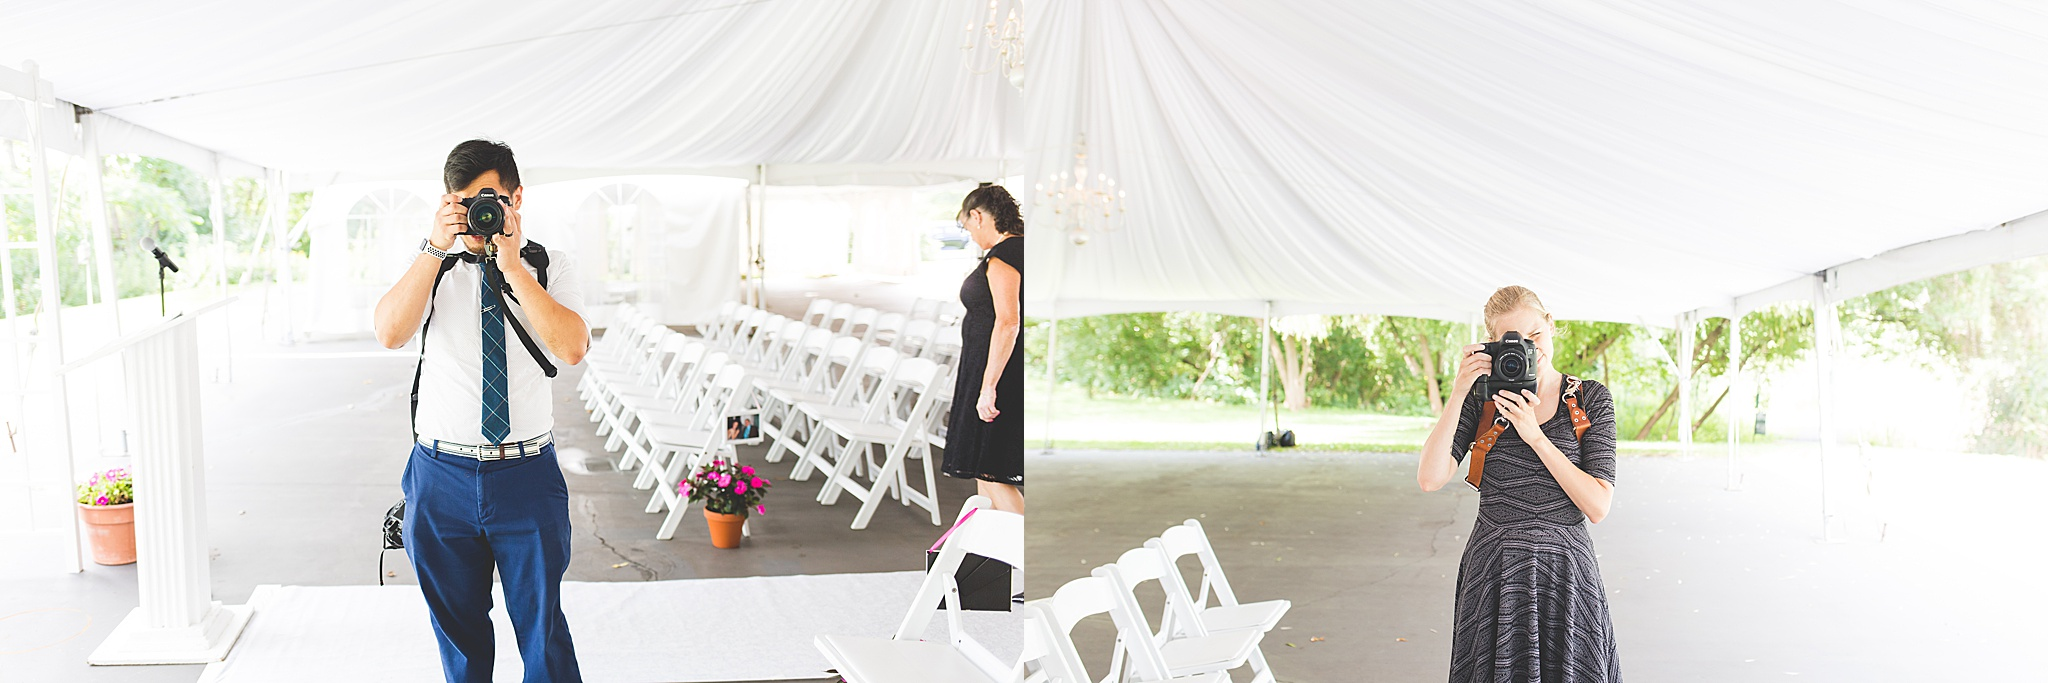 Albany_Wedding_Photographer_7623.jpg